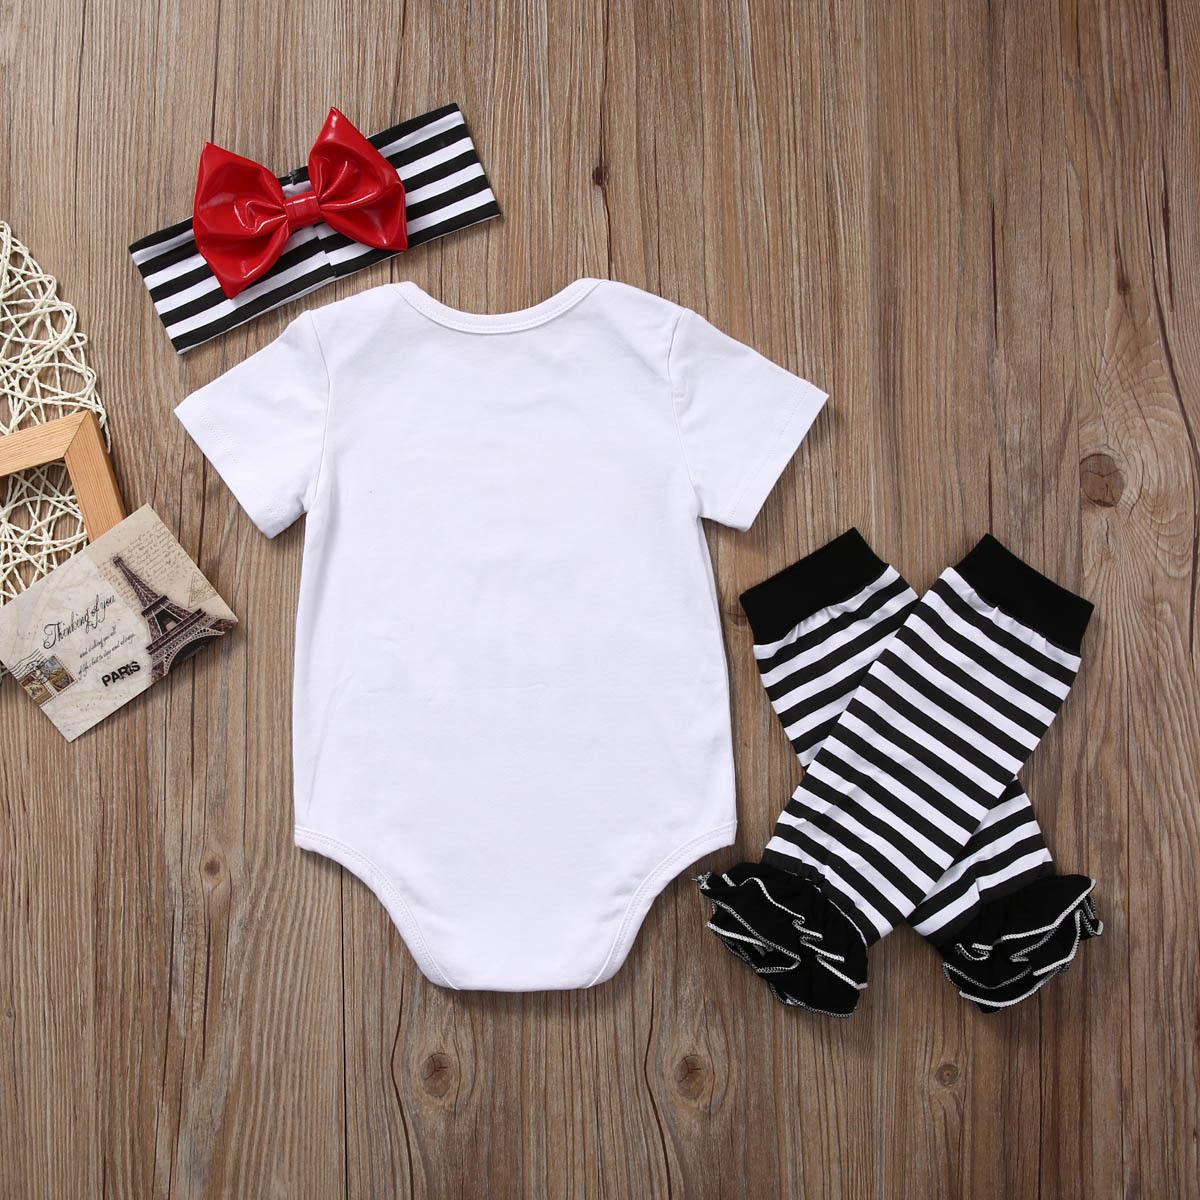 Cute Newborn Baby Girl ტანსაცმელი - ტანსაცმელი ჩვილებისთვის - ფოტო 6